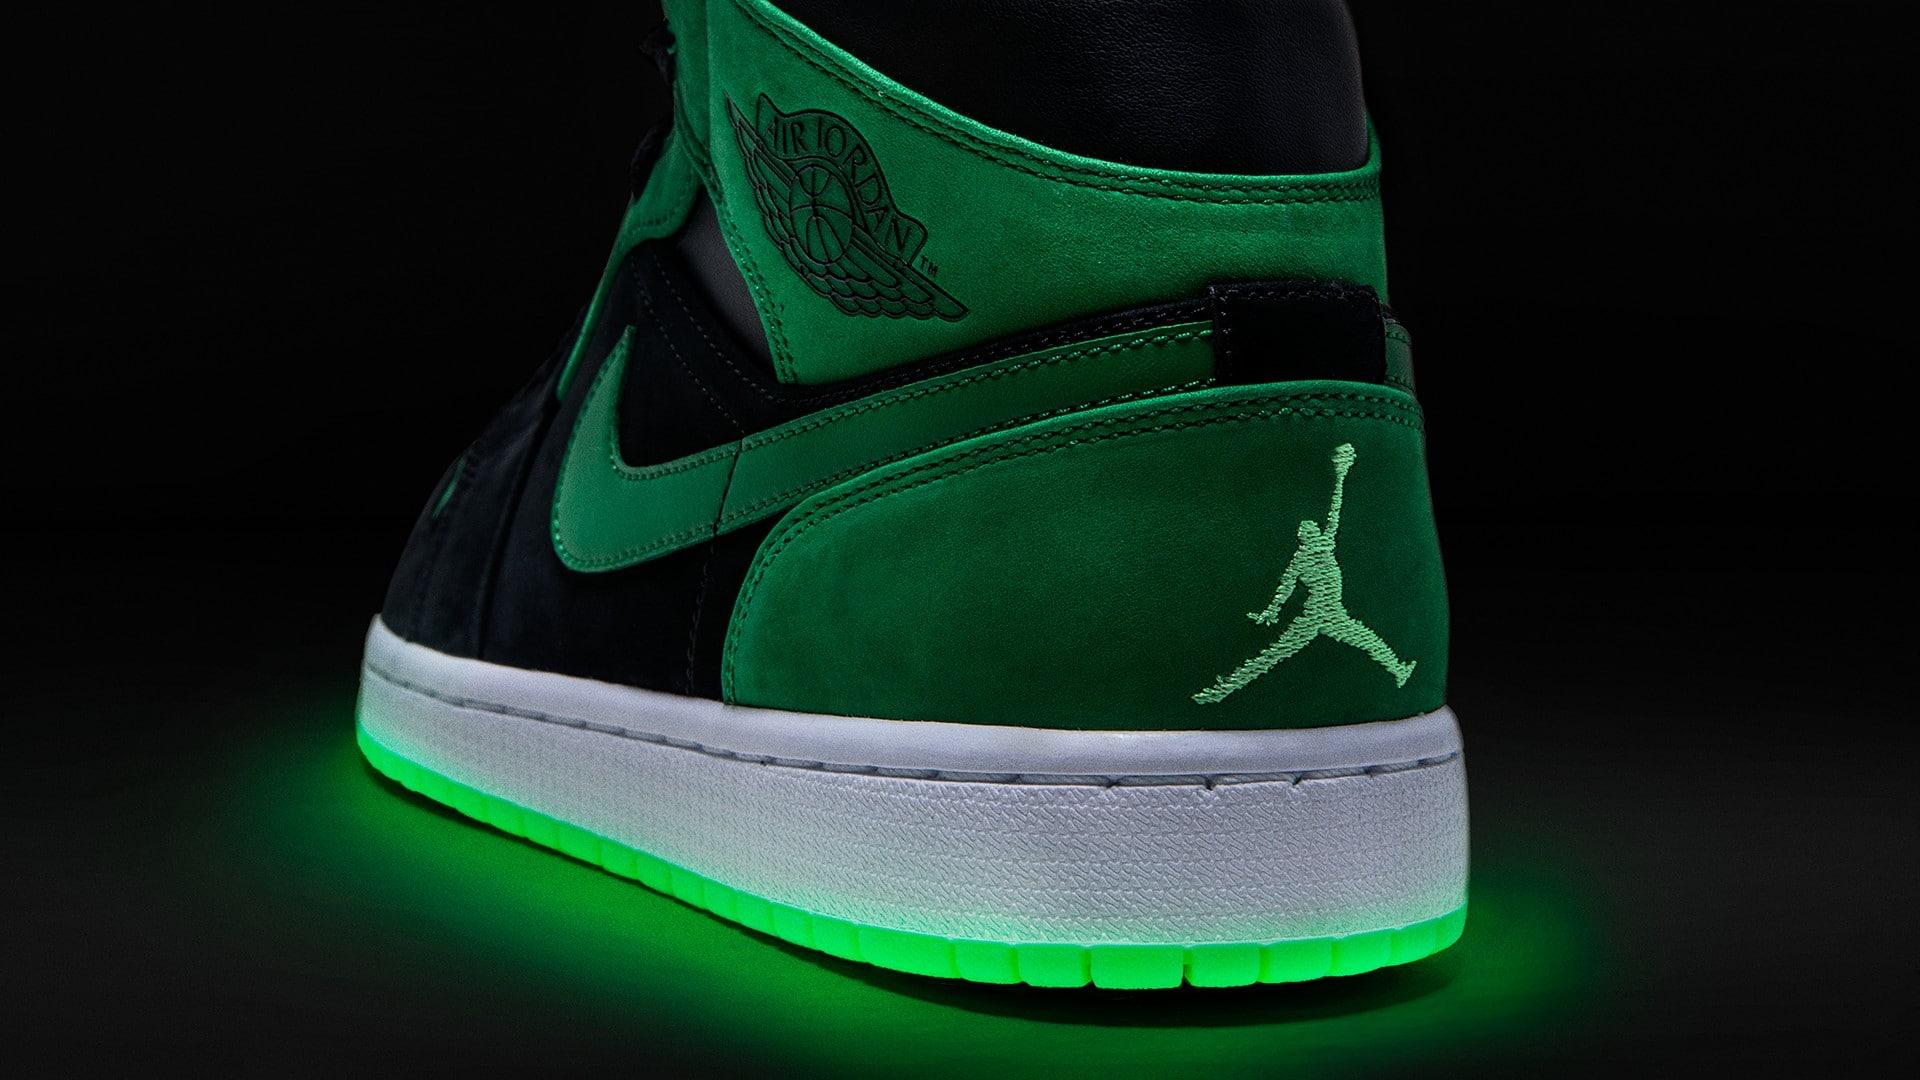 Xbox Green & Black Air Jordan I: Perfekte Sneakers für Gamer?!